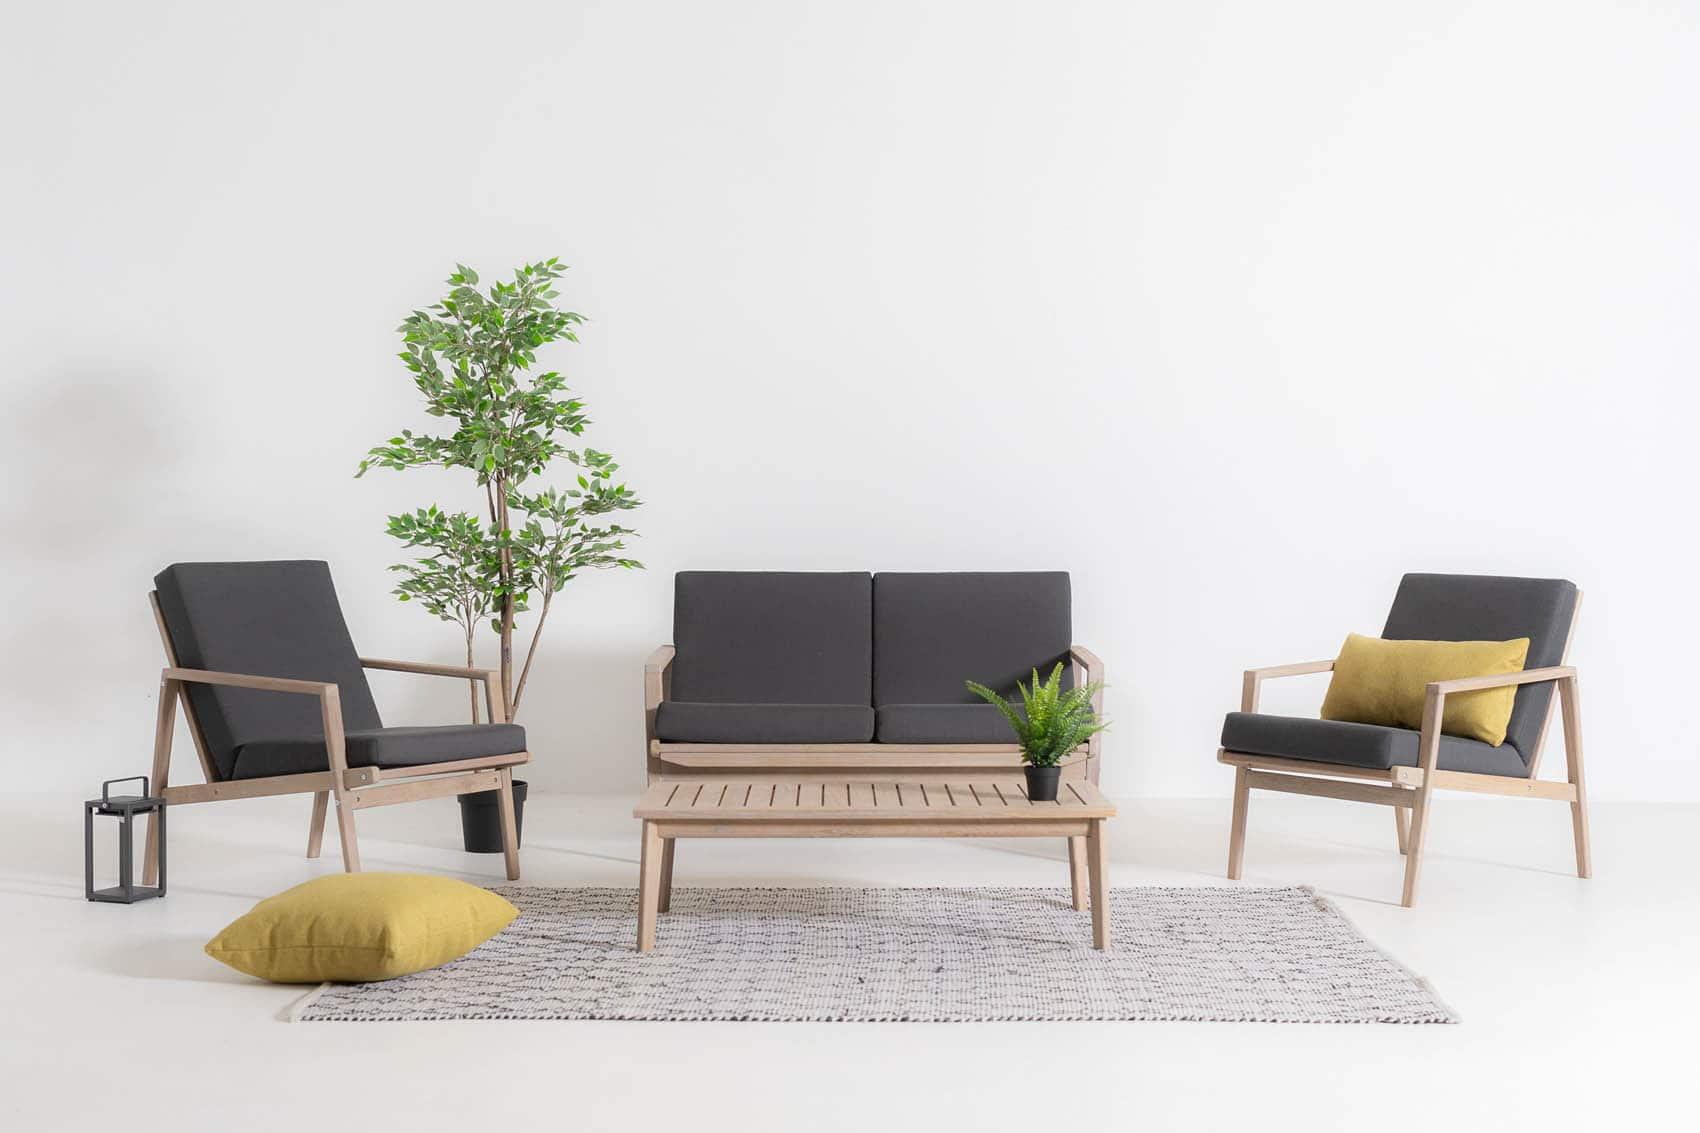 Stoel - bank - tafel loungeset